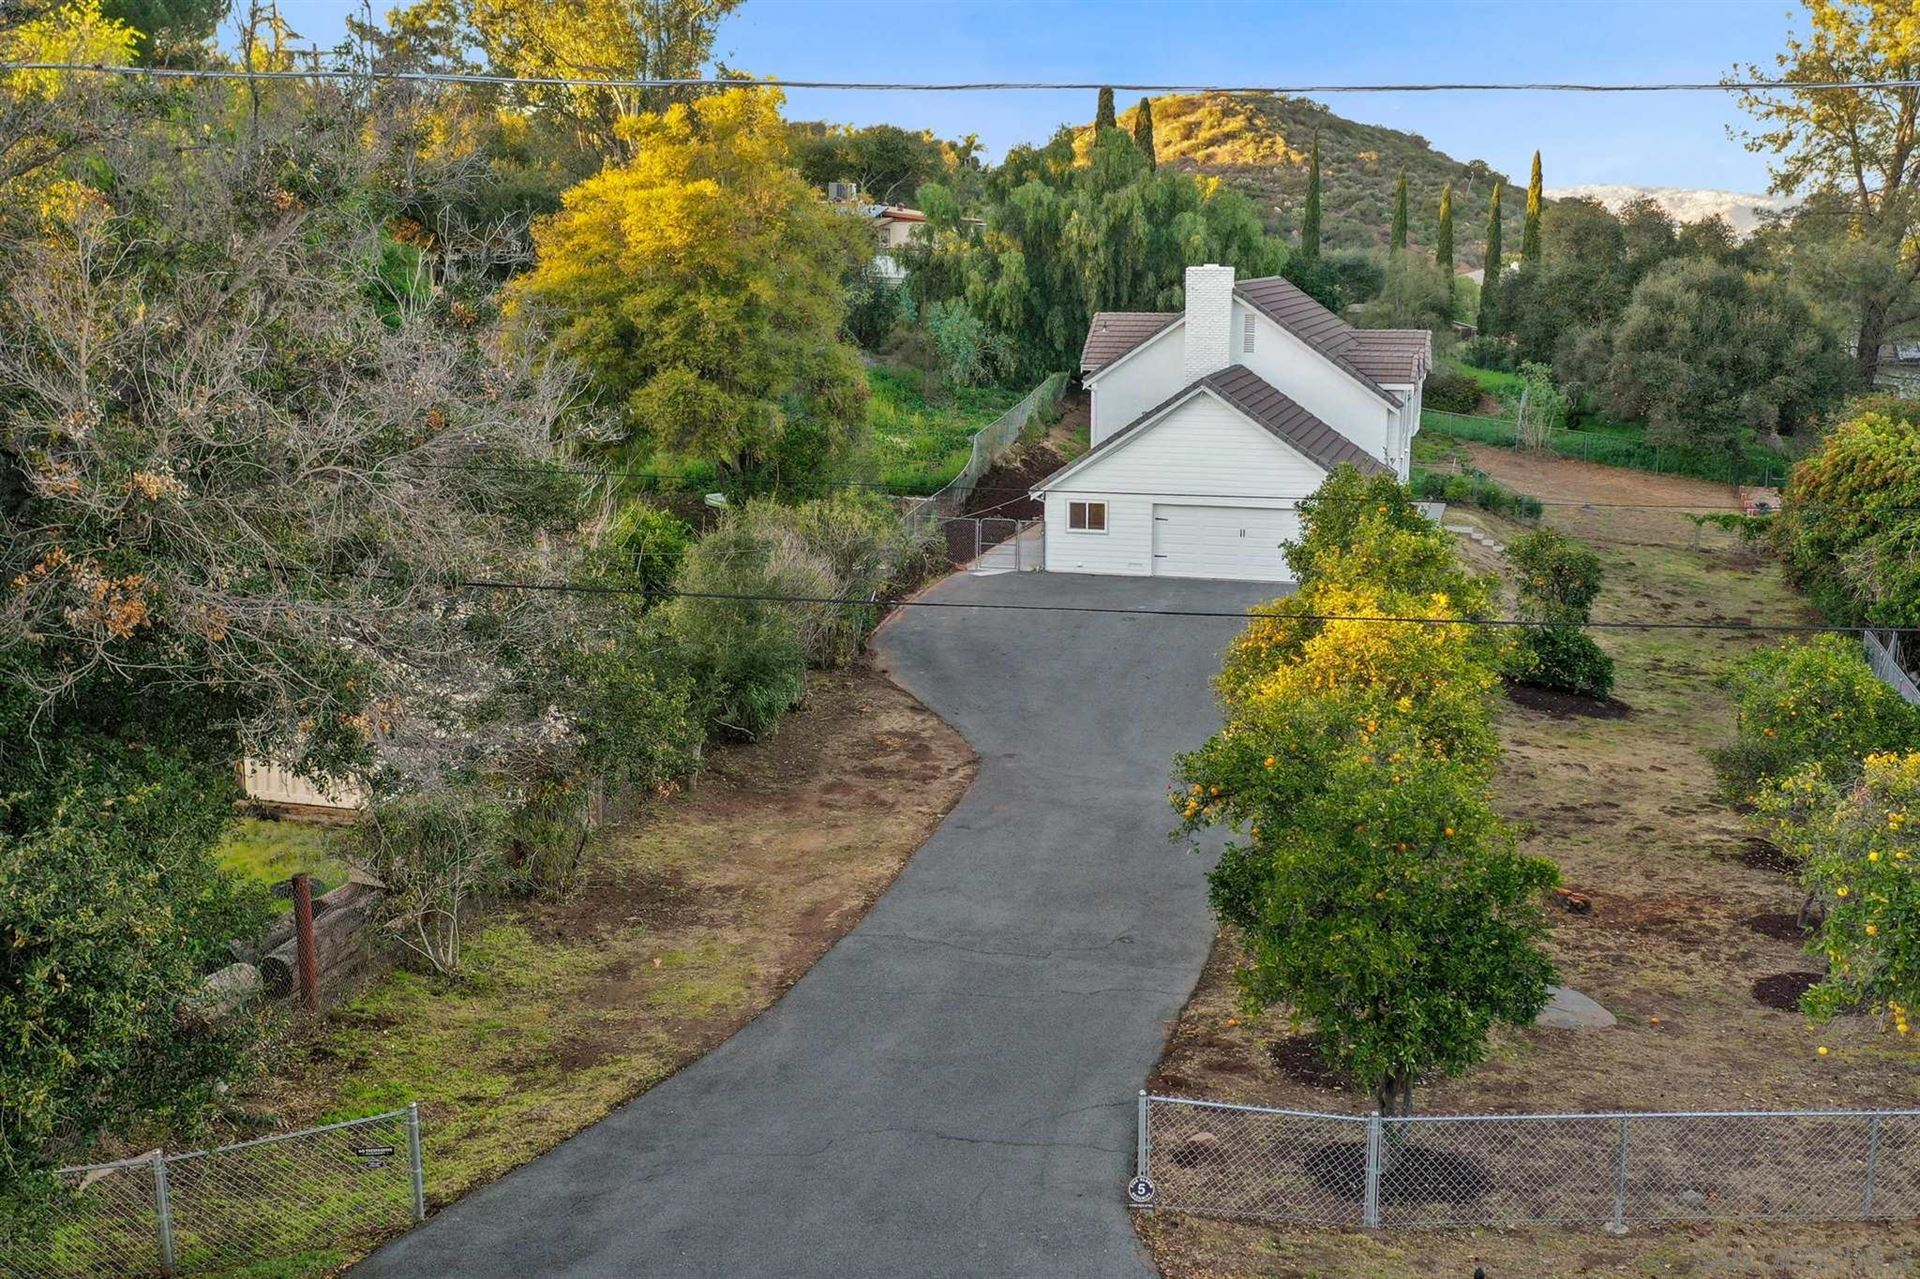 Photo of 1162 Felicita Ln, Escondido, CA 92029 (MLS # 210005808)